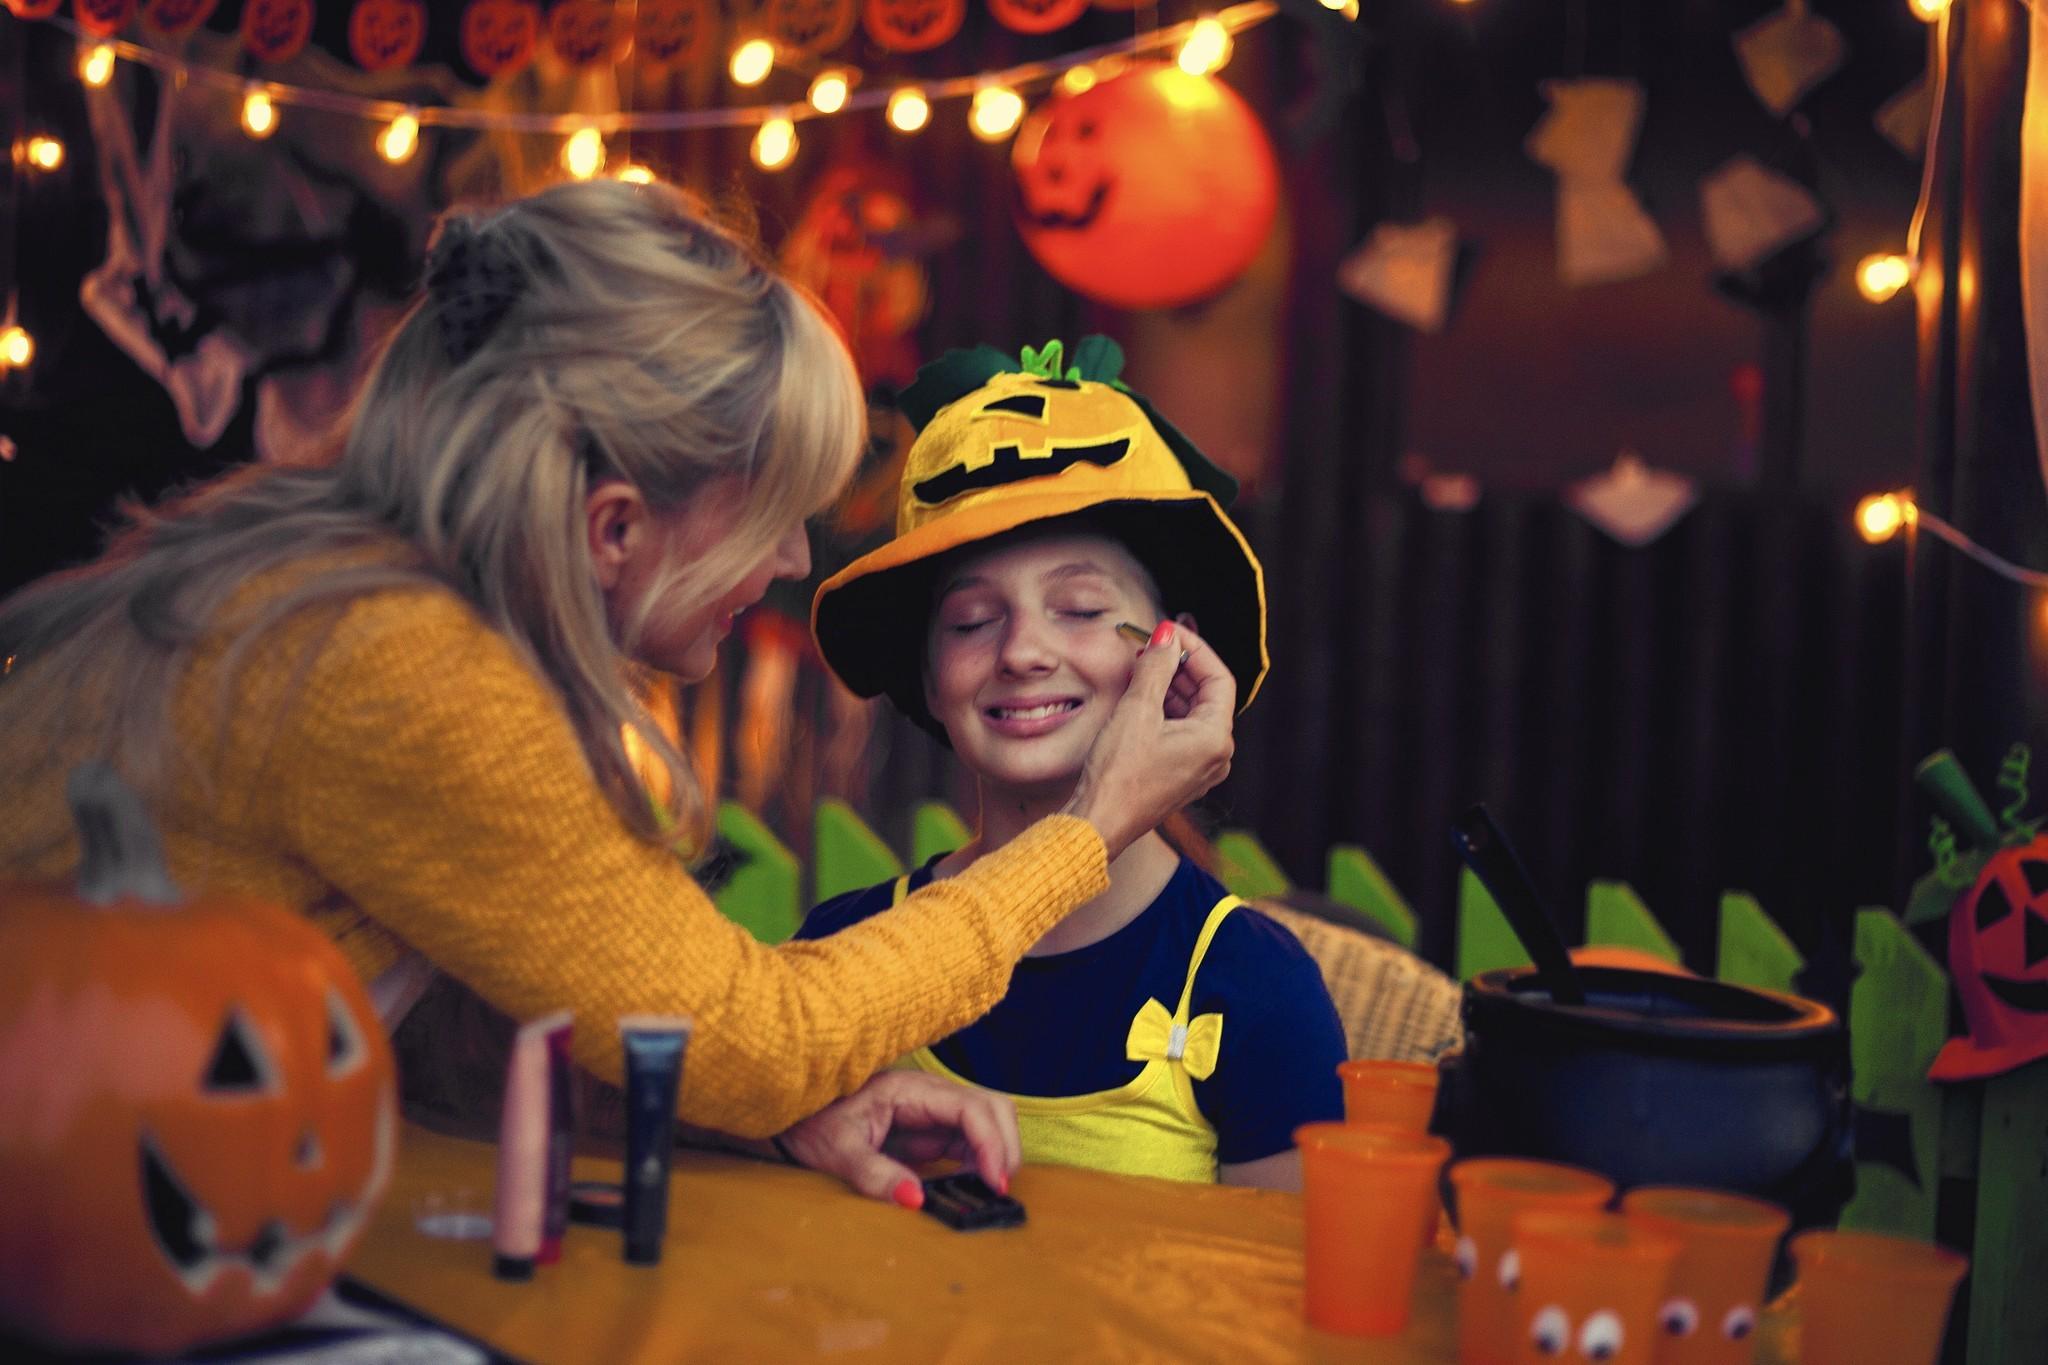 My kidsu0027 stepmom made their Halloween costumes and thatu0027s more than OK - Chicago Tribune  sc 1 st  Chicago Tribune & My kidsu0027 stepmom made their Halloween costumes and thatu0027s more than ...